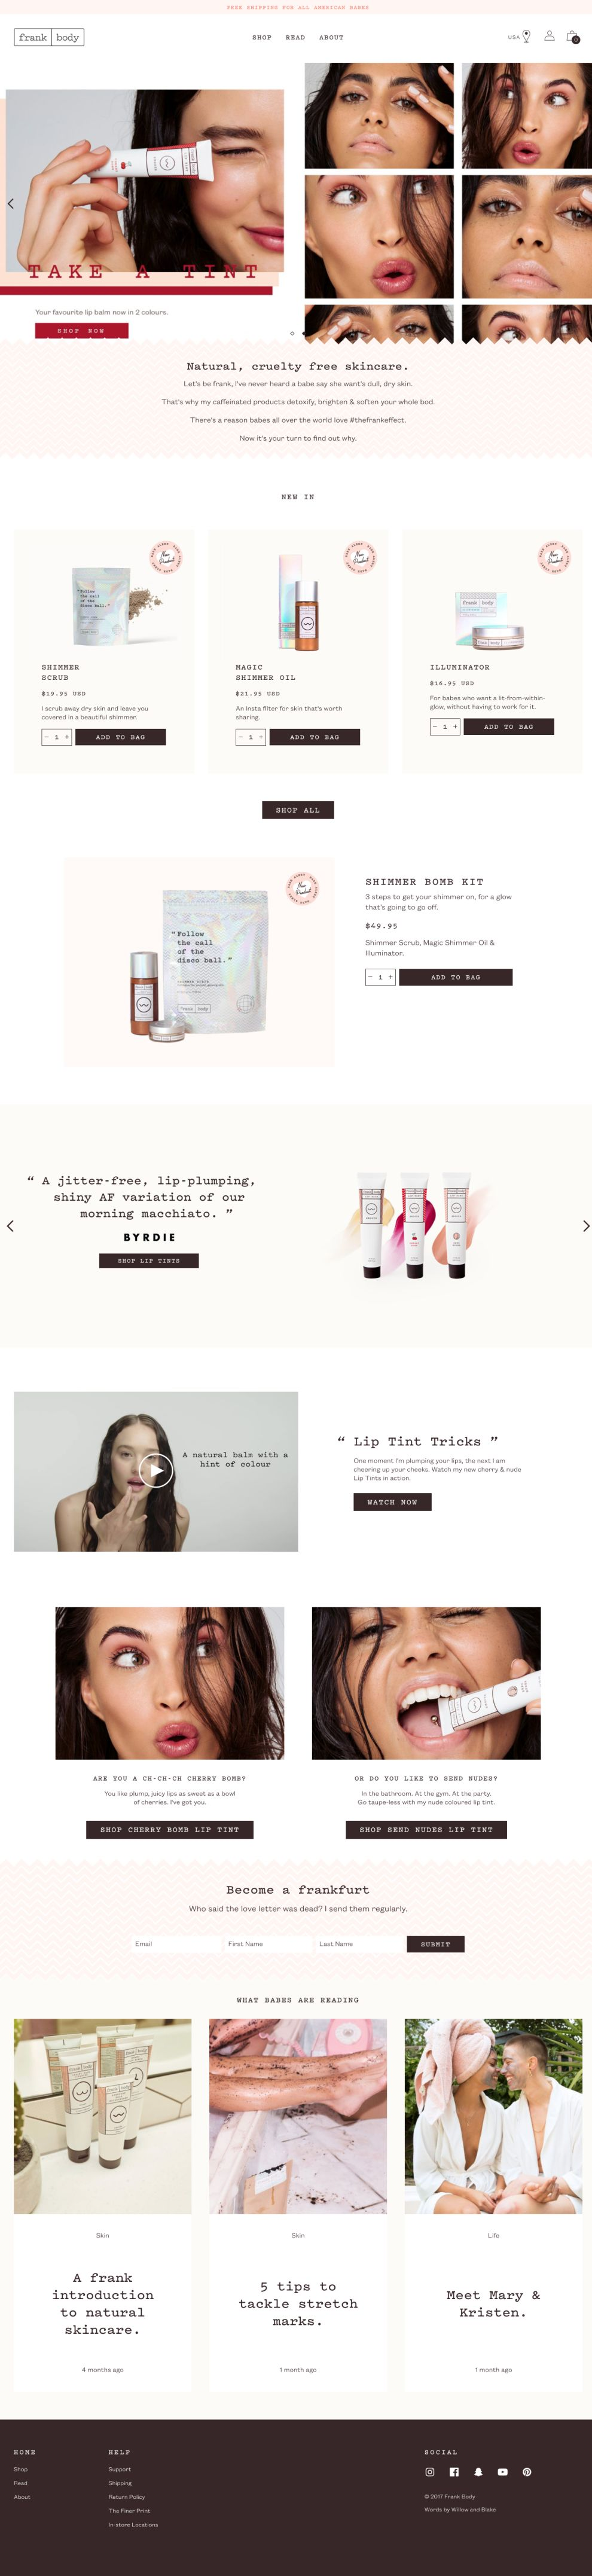 Frank Body Clean Homepage